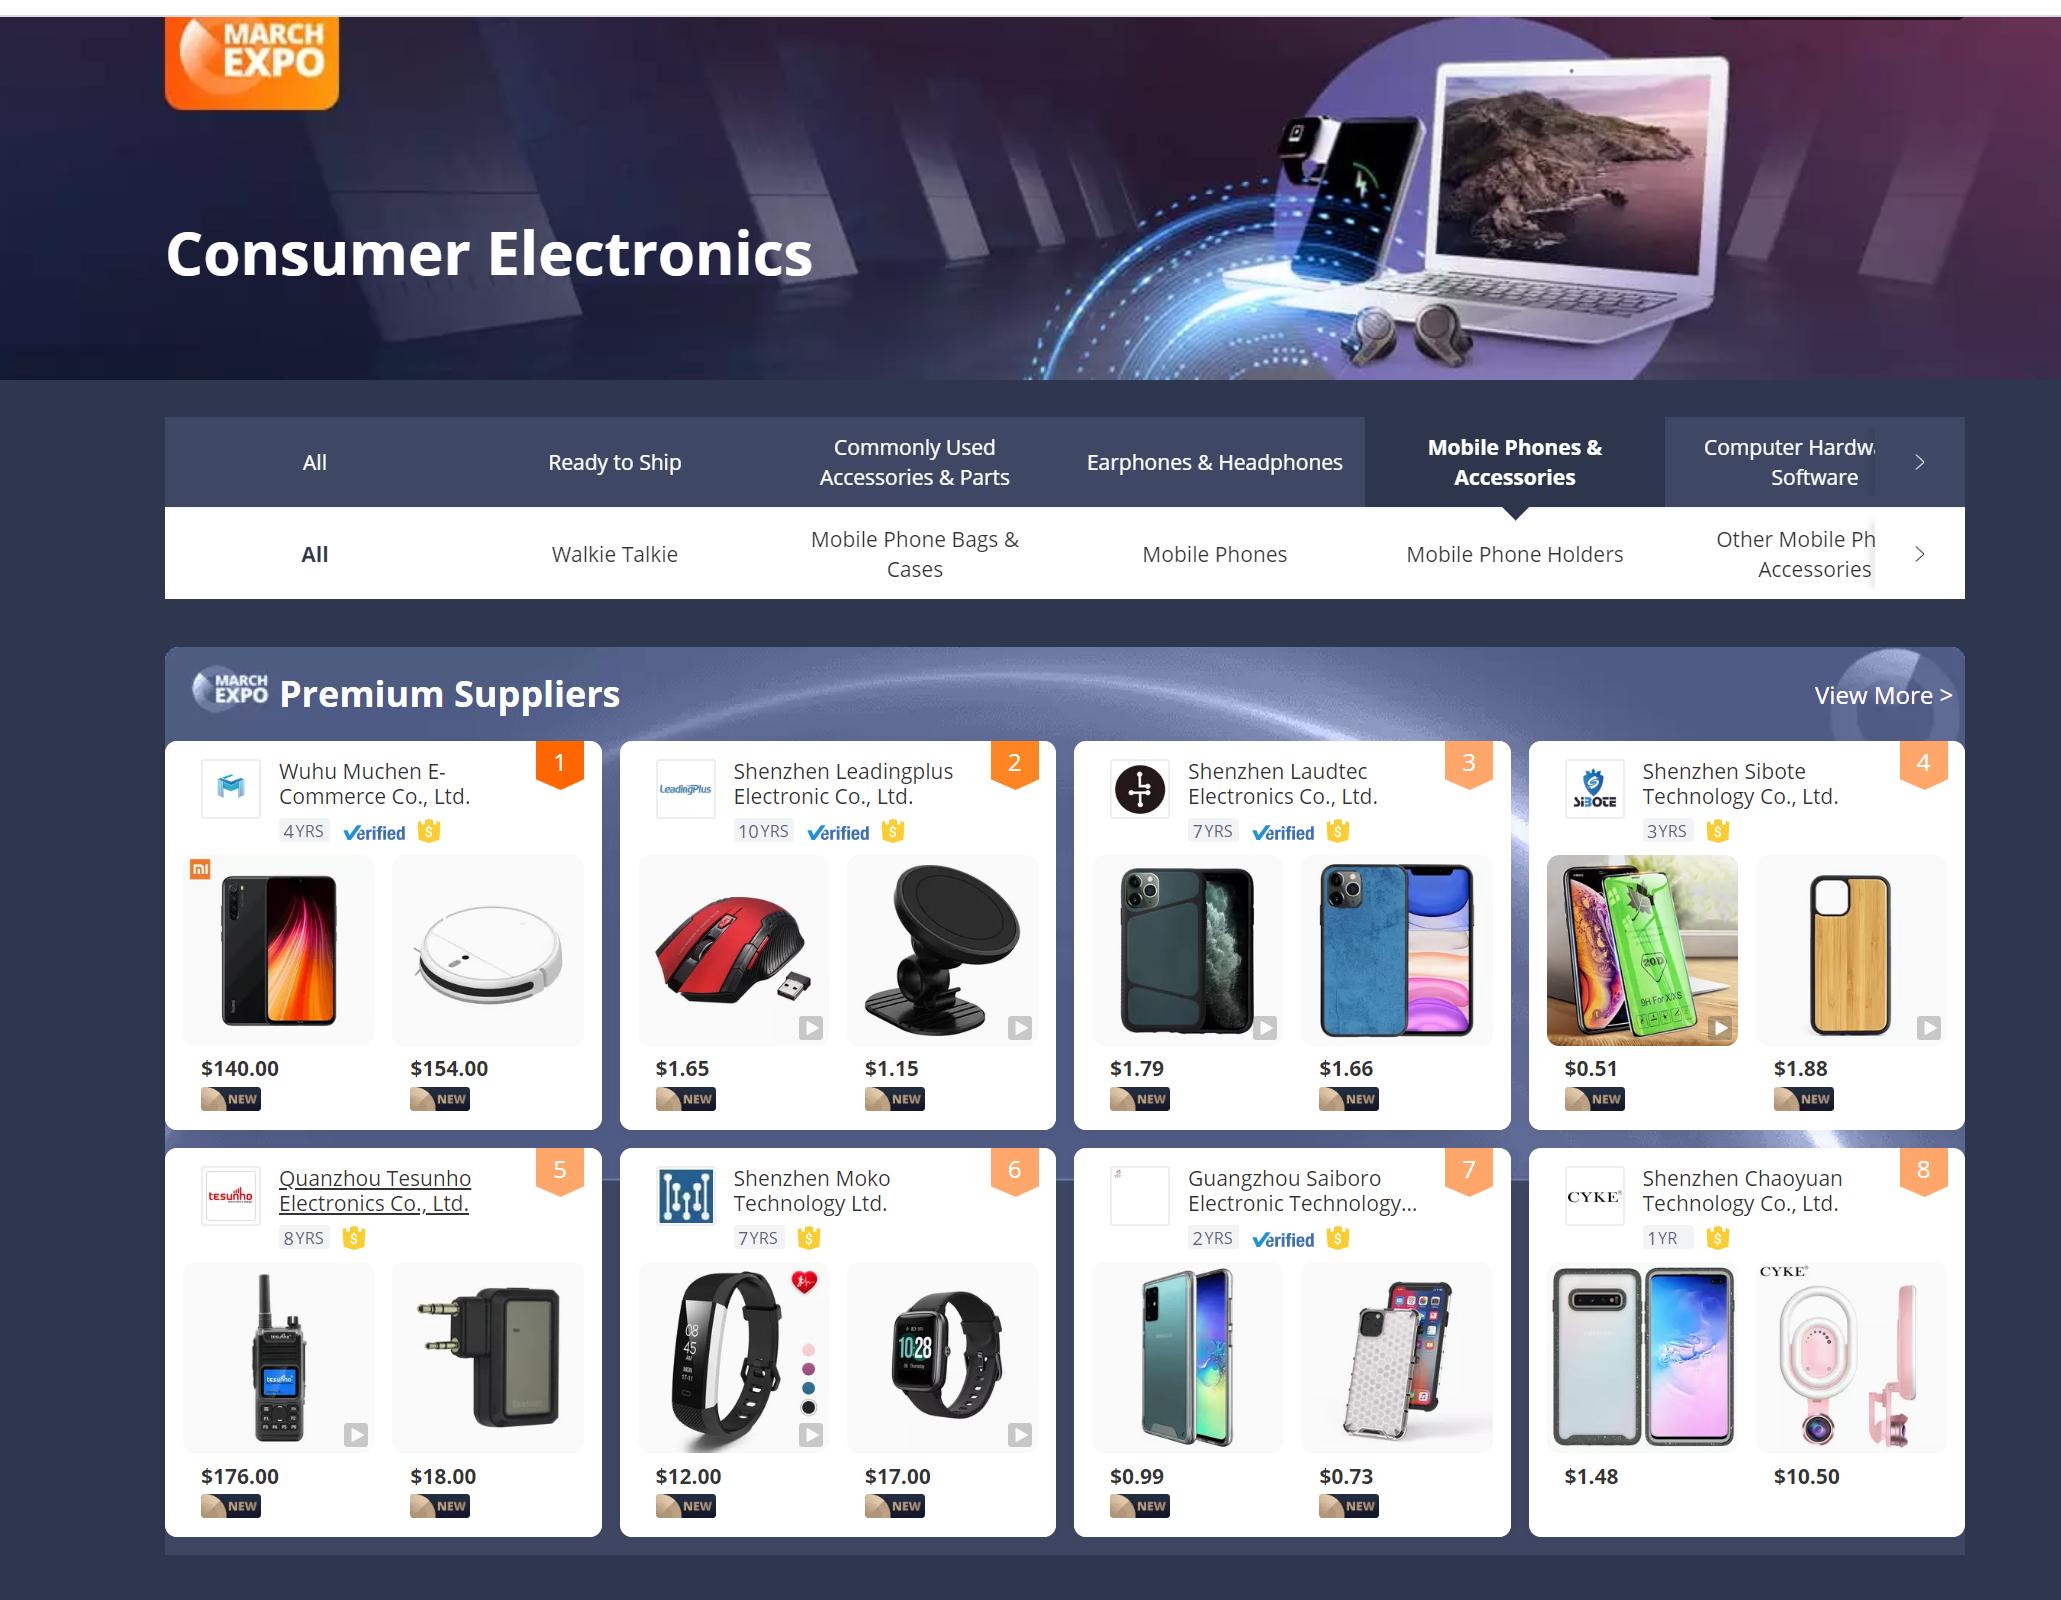 Top5 kept on B2B platform in walkie talkie catalog